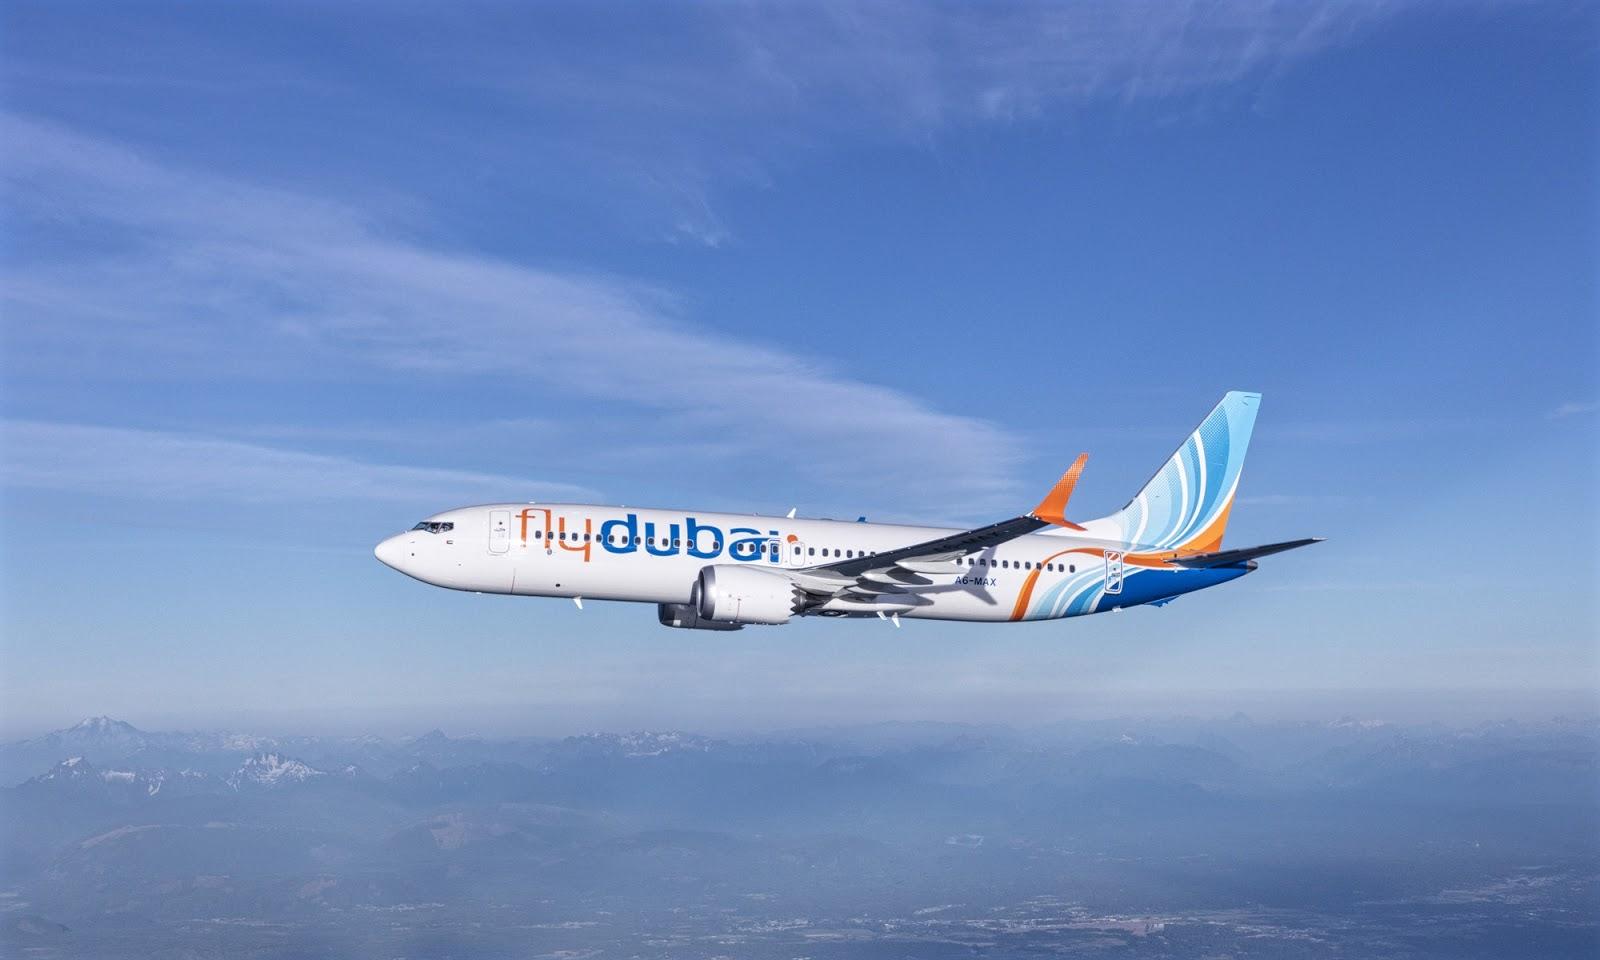 FlyDubai Boeing 737 MAX 9 Joy Flight Photo Shoot